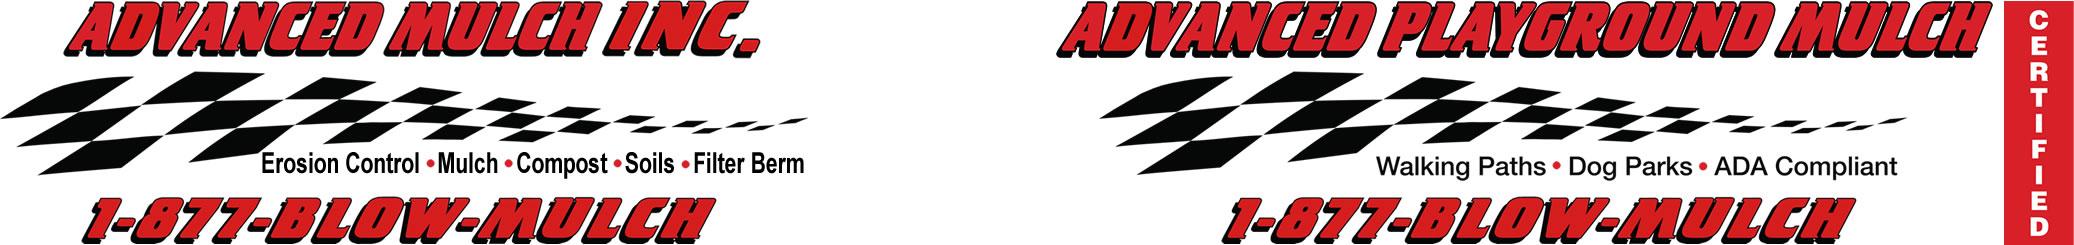 Advanced Mulch, Inc